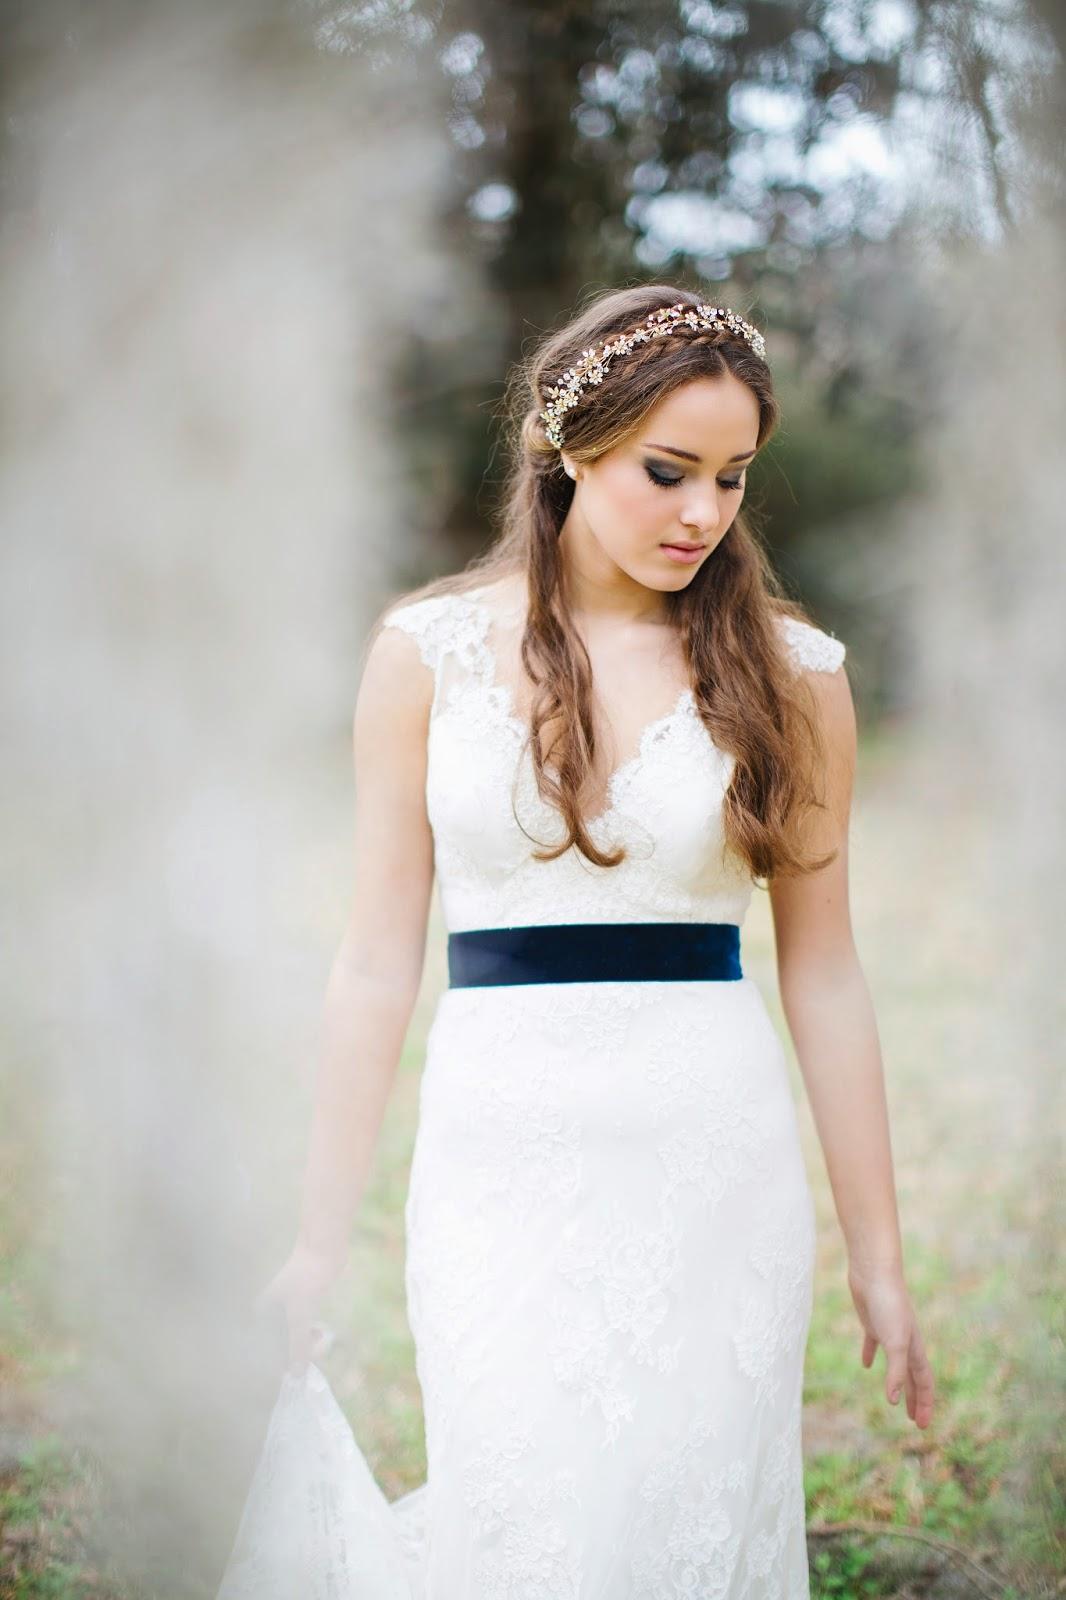 My Wedding Zone | BRIDAL LOOKBOOK 1.0 {part 4} Rebecca Schoneveld